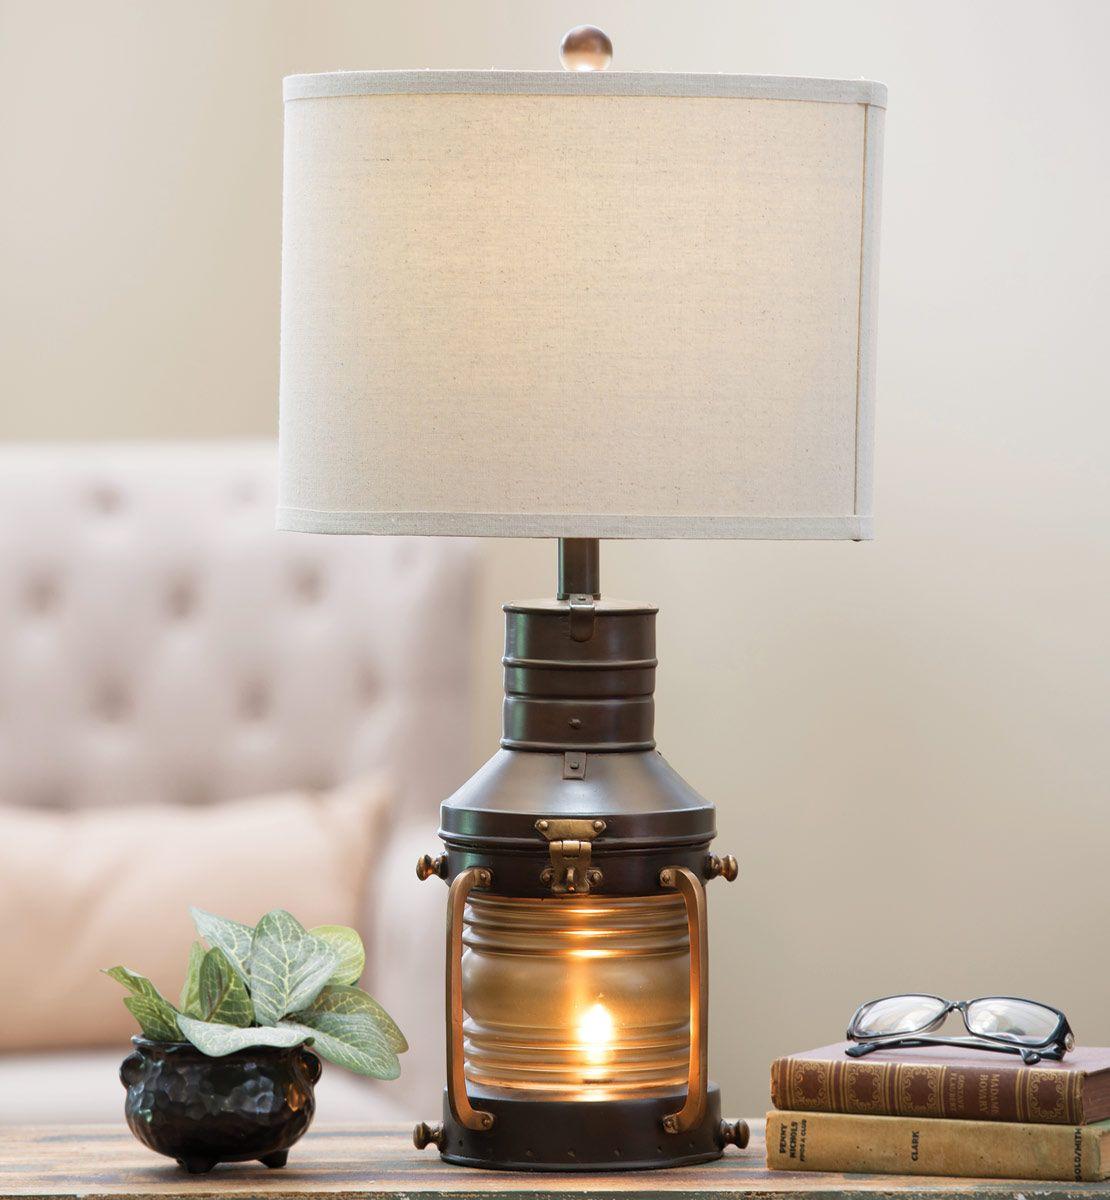 Rustic Lantern Table Lamp Iron lamp shade, Lantern table